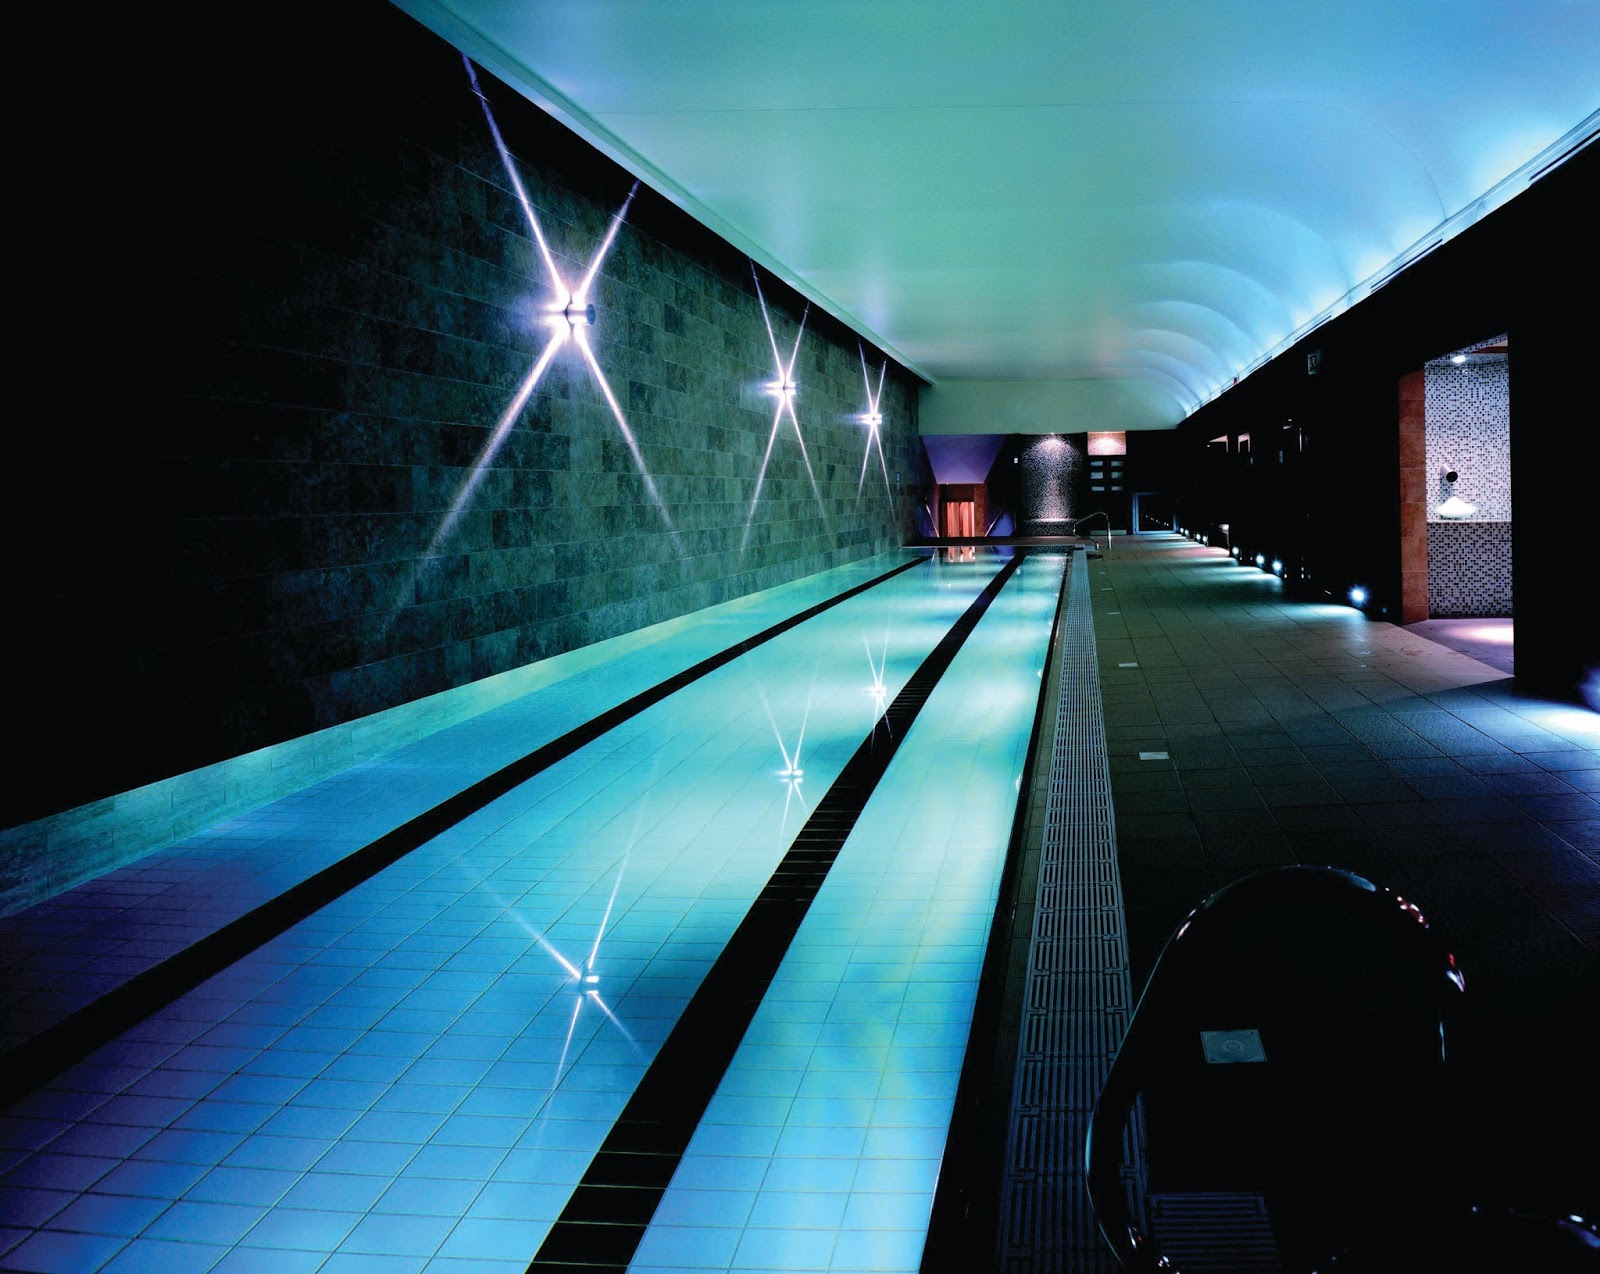 Amida Spa Pool Chelsea Harbour Club